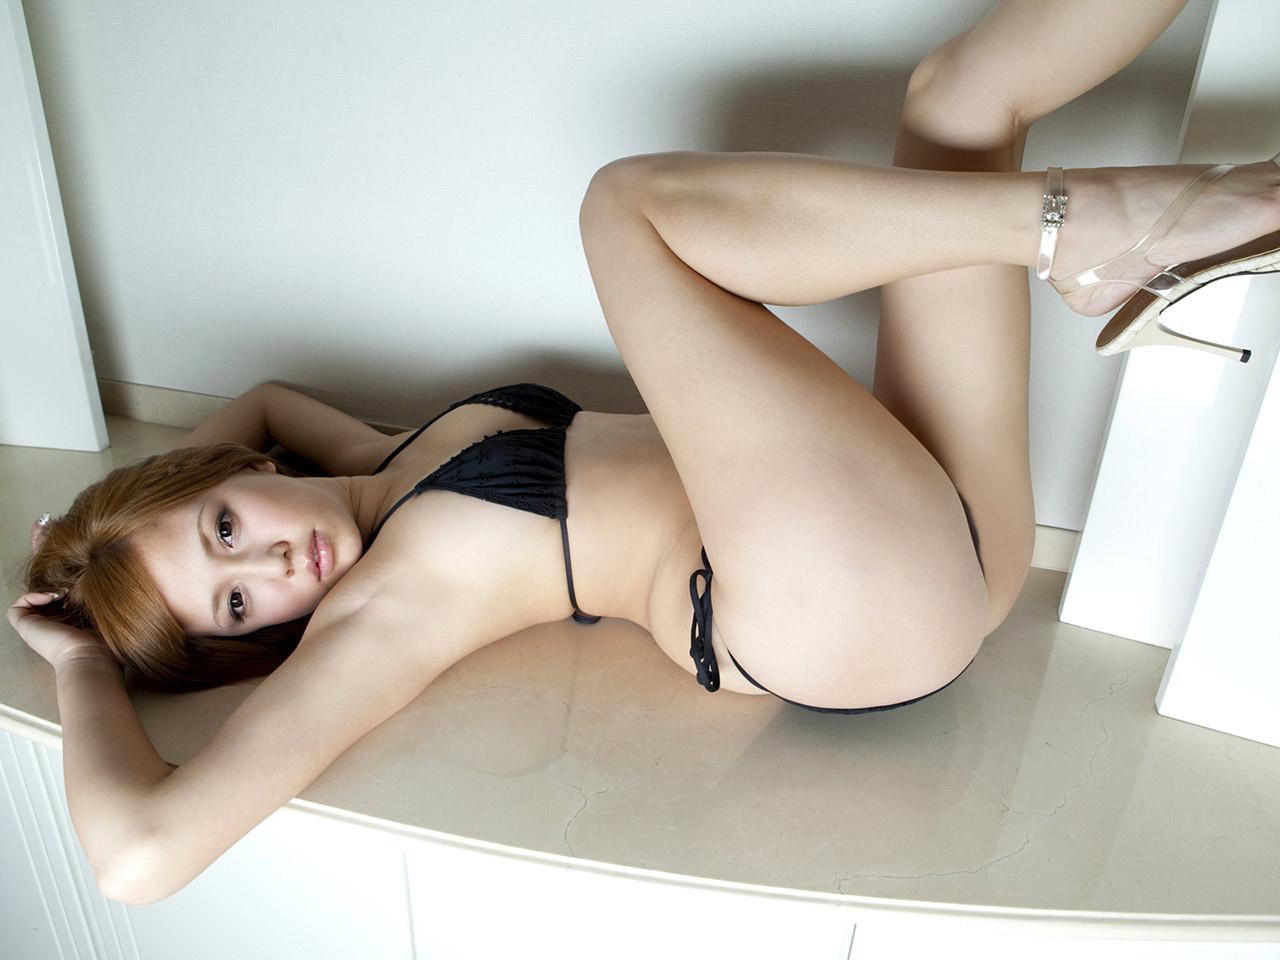 manami marutaka hot bra and panty pics 01